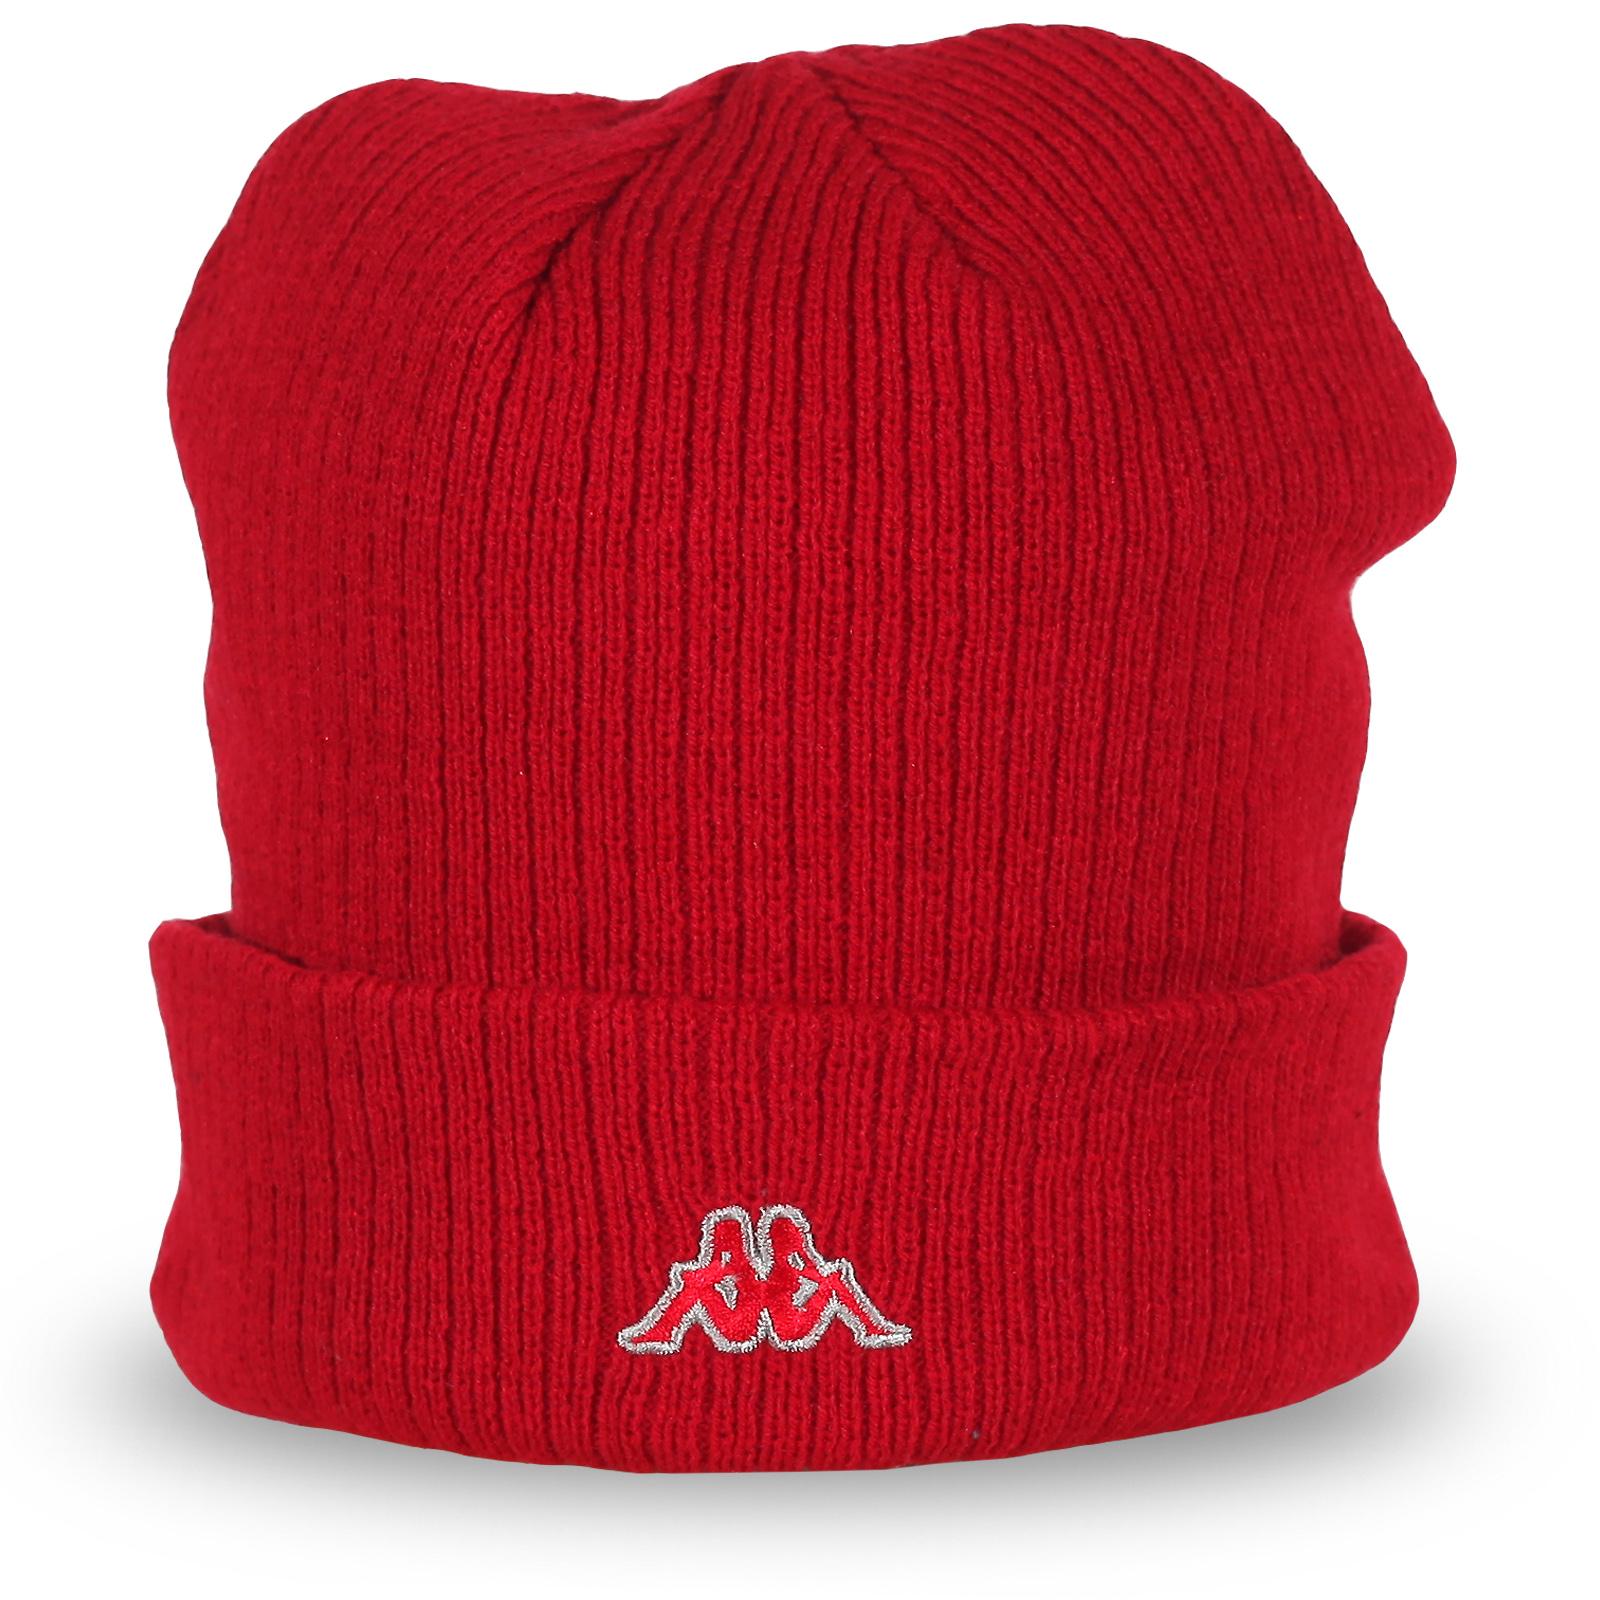 Шапка Kappa красного цвета